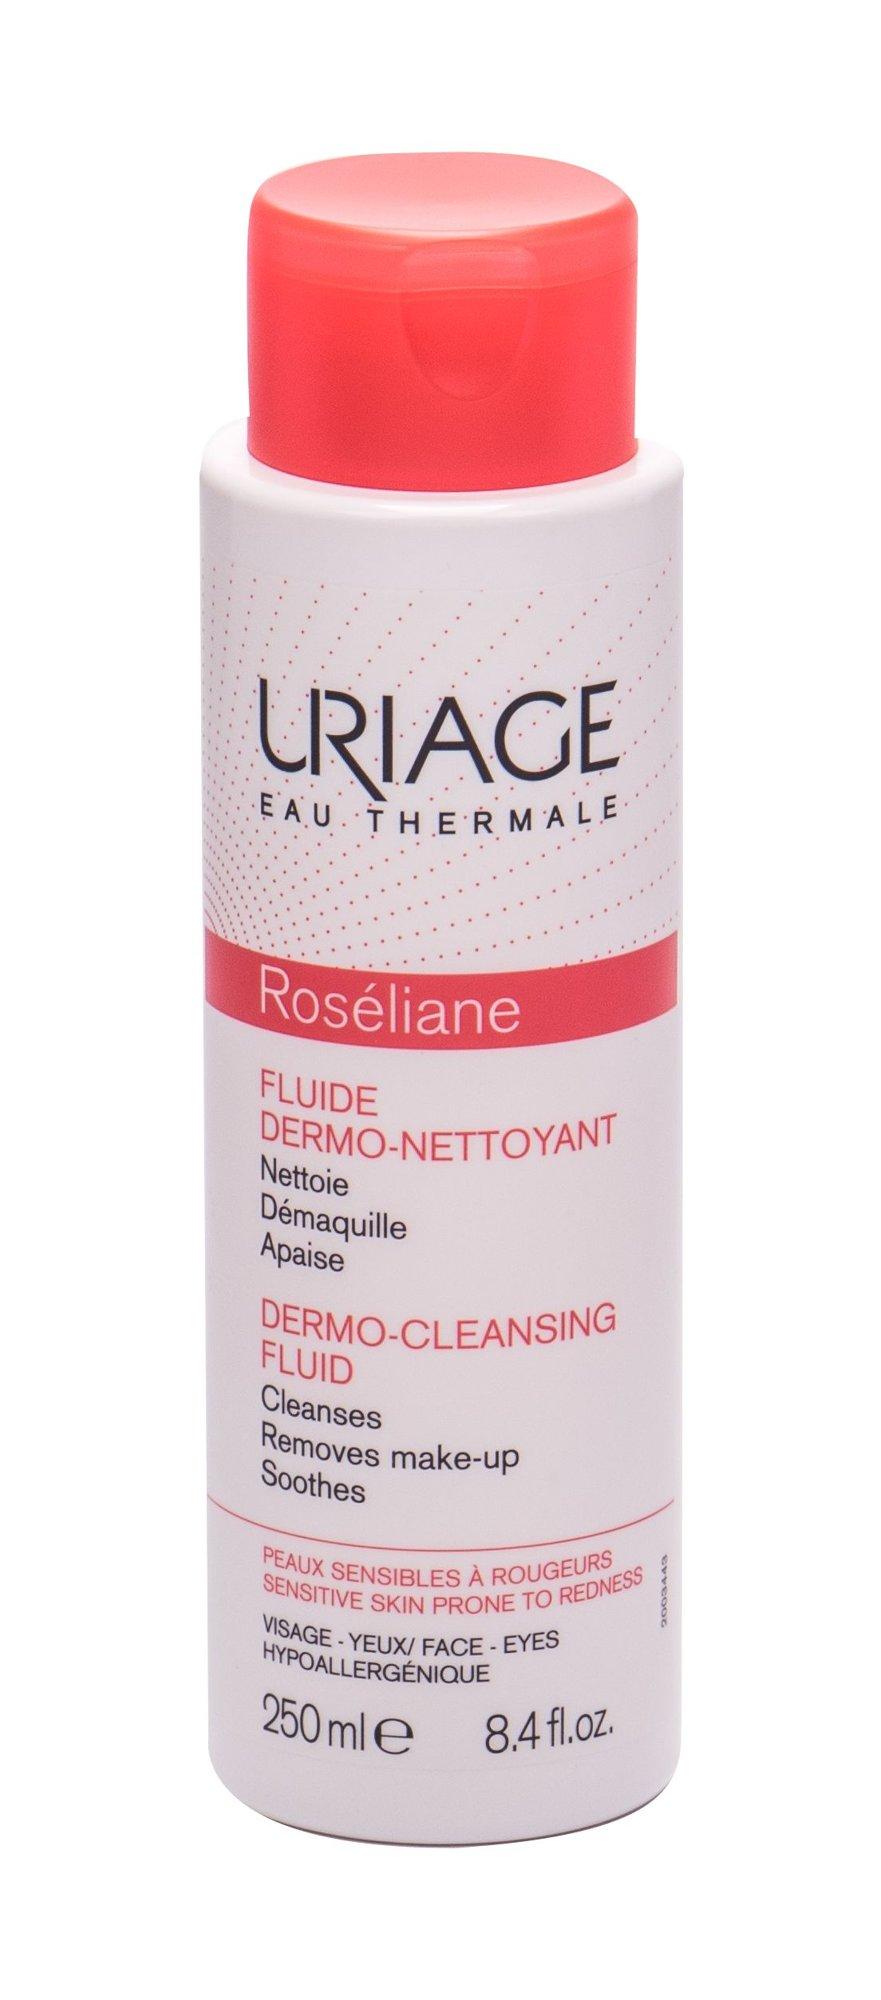 Uriage Eau Thermale Roséliane Face Cleansers 250ml  Dermo-Cleansing Fluid